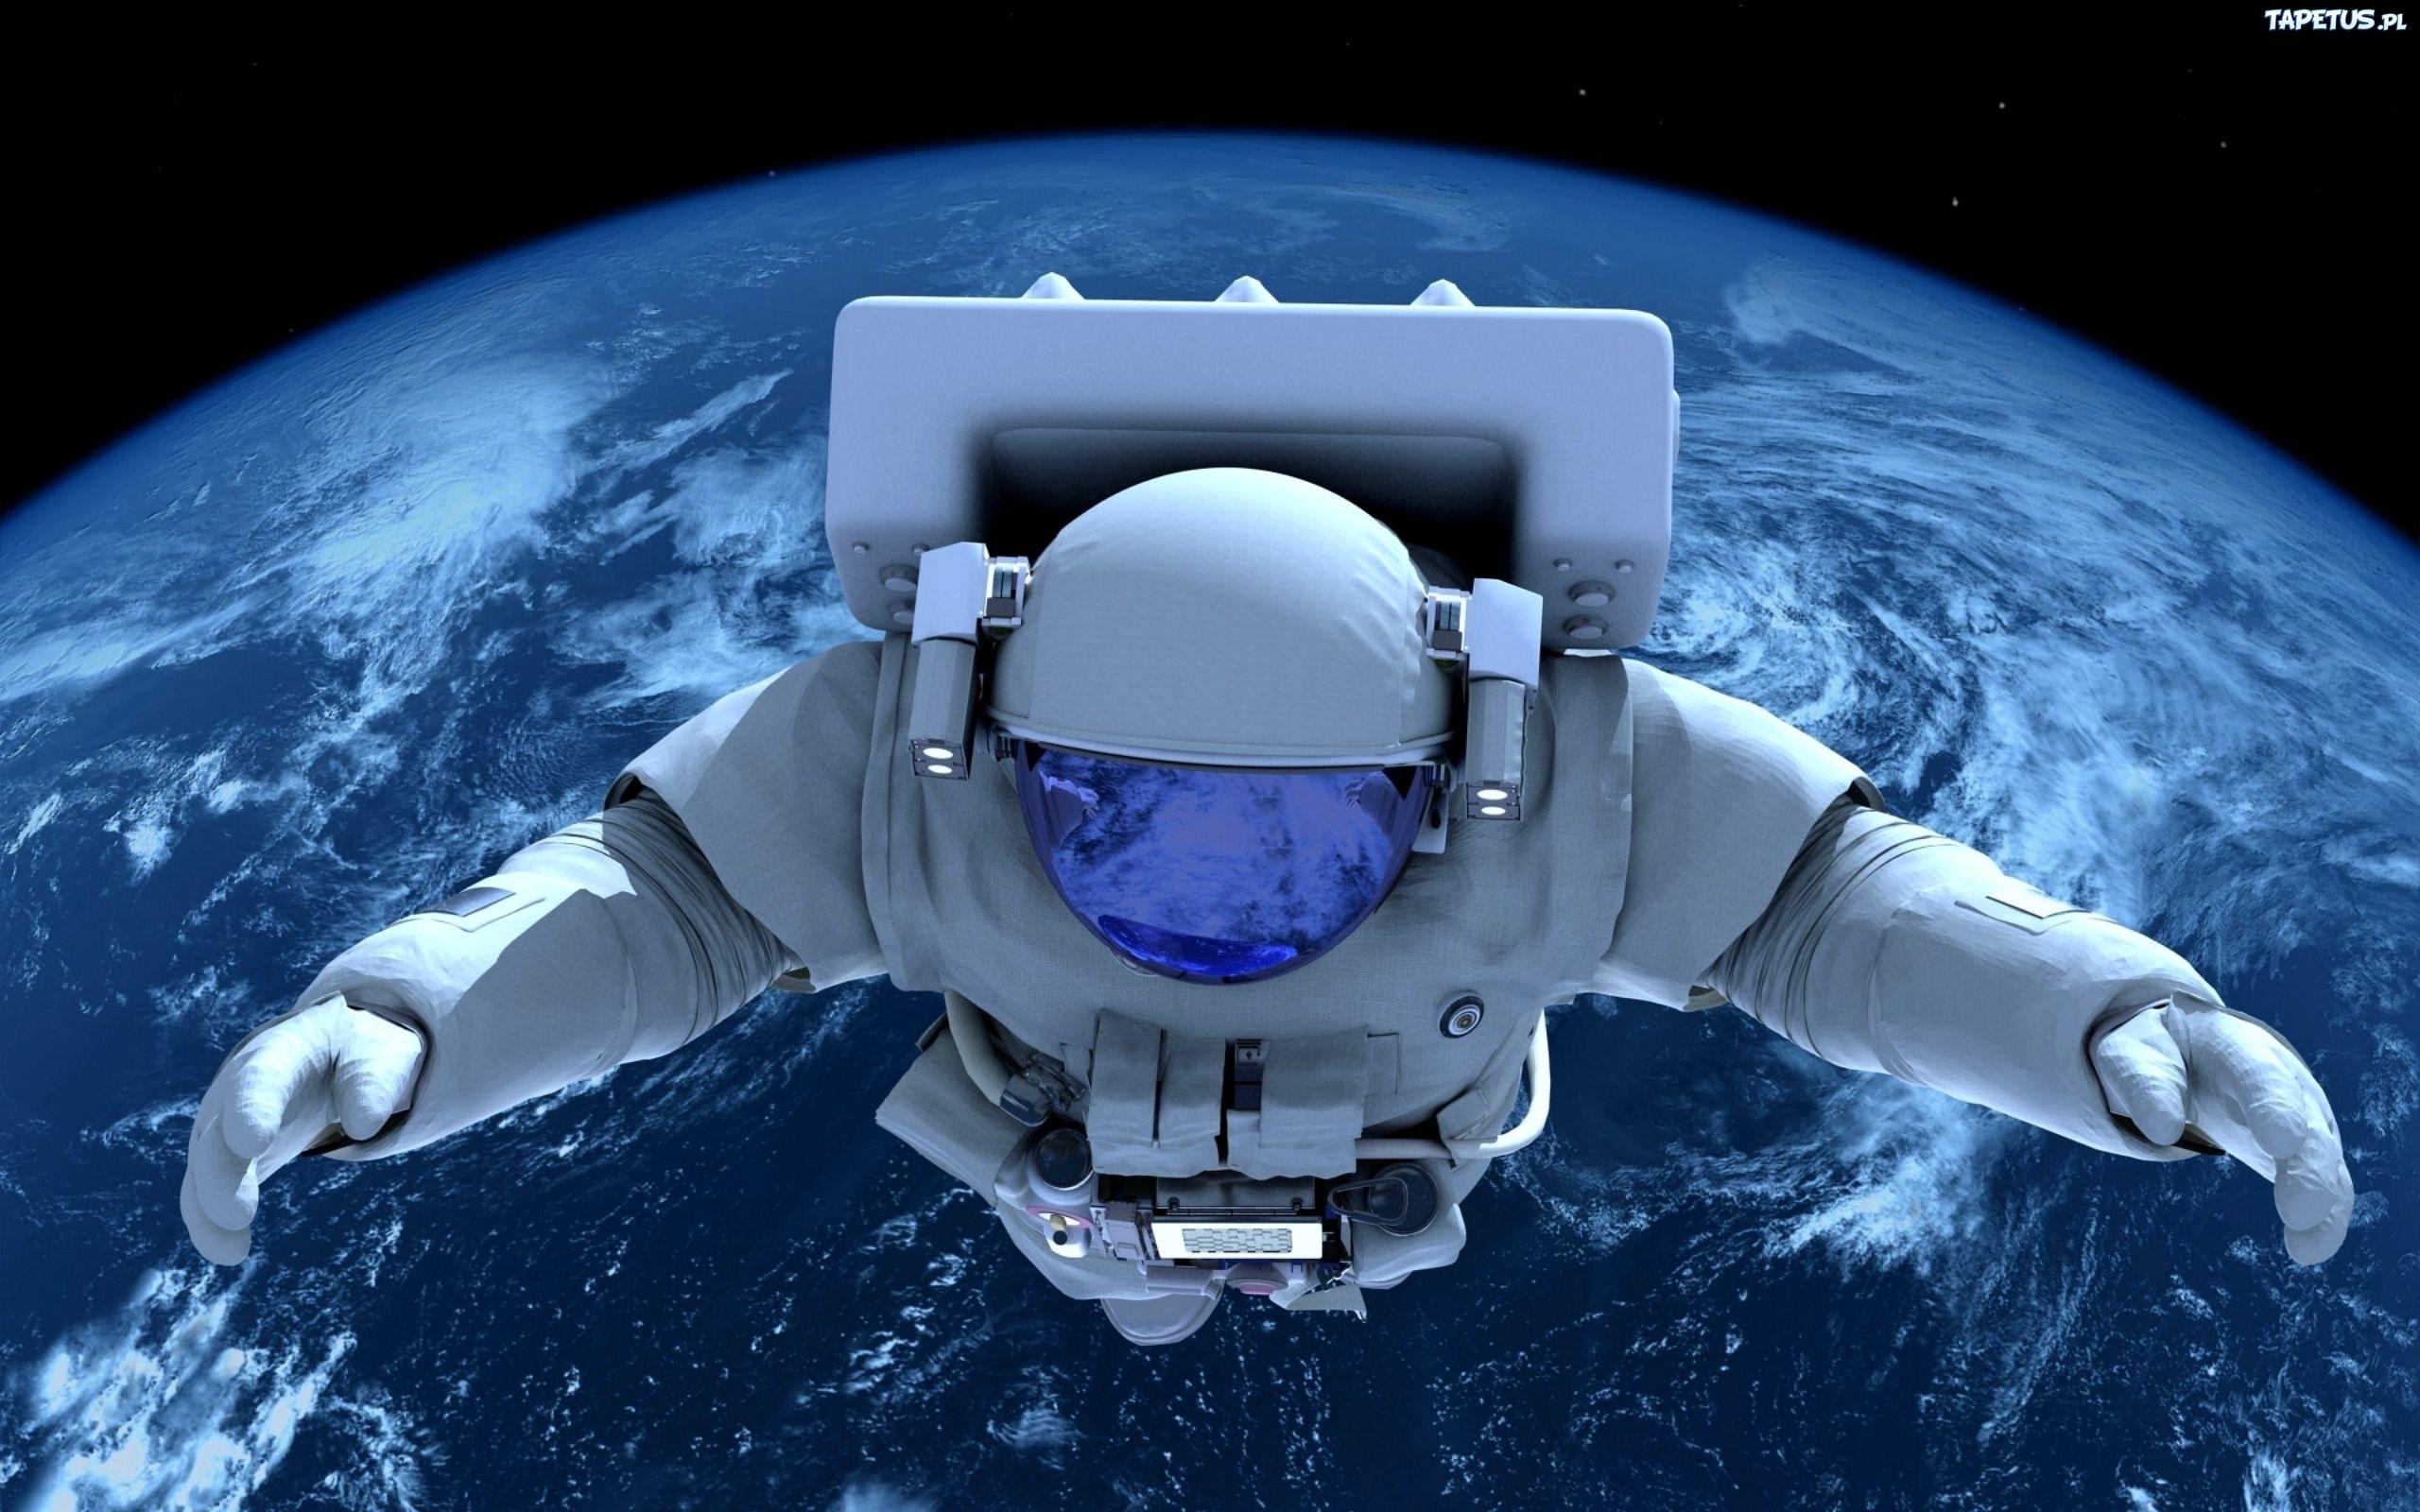 237356_planeta-ziemia-astronauta-kosmos.jpg